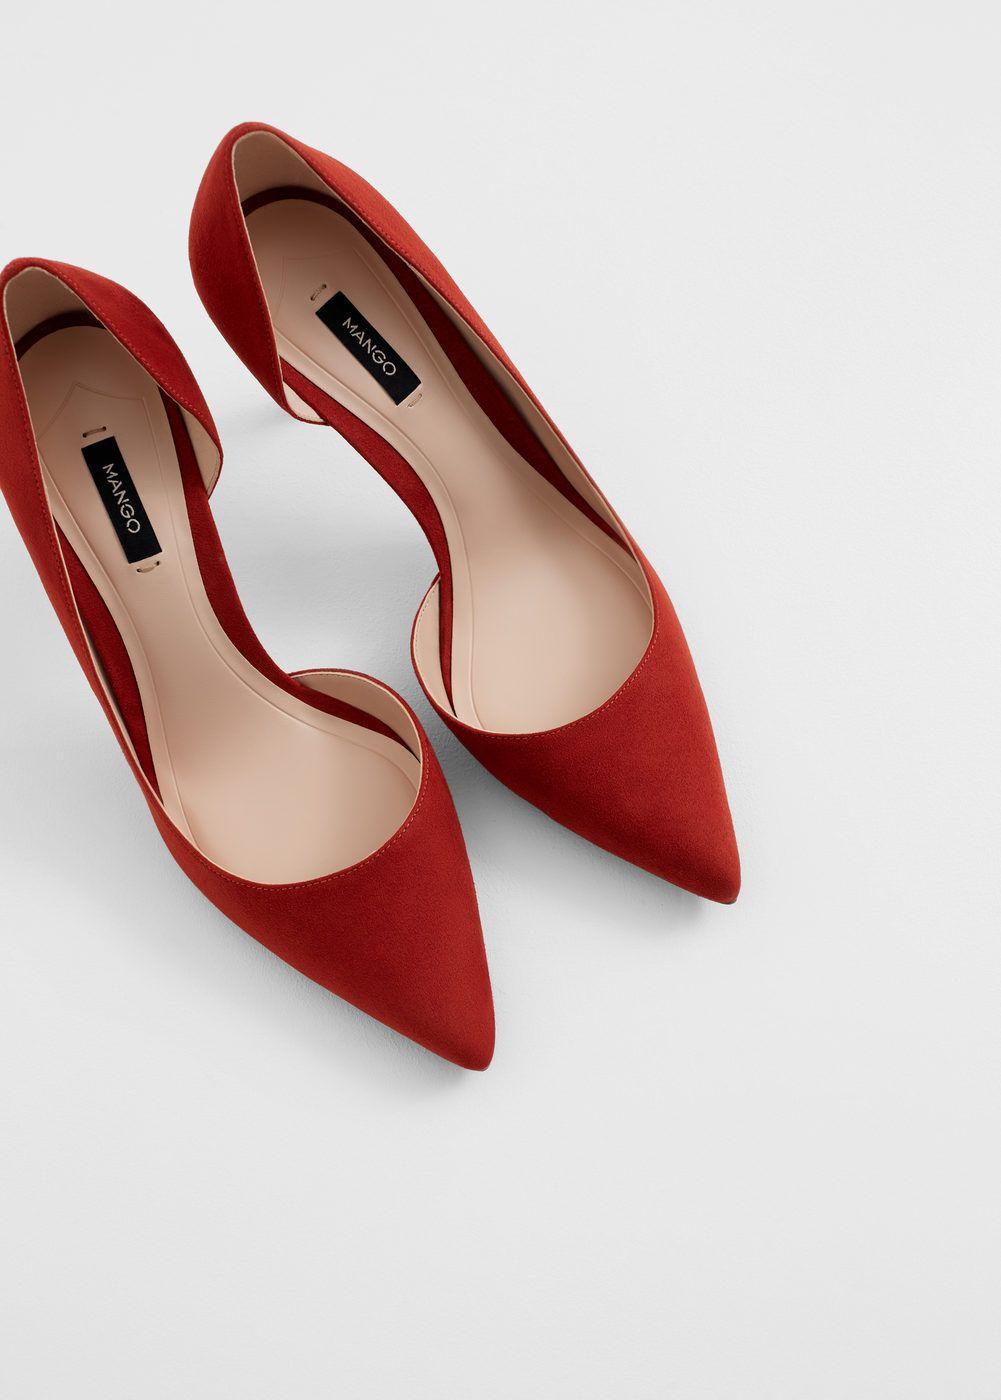 016c9978045 Zapato salón - Zapatos de Mujer